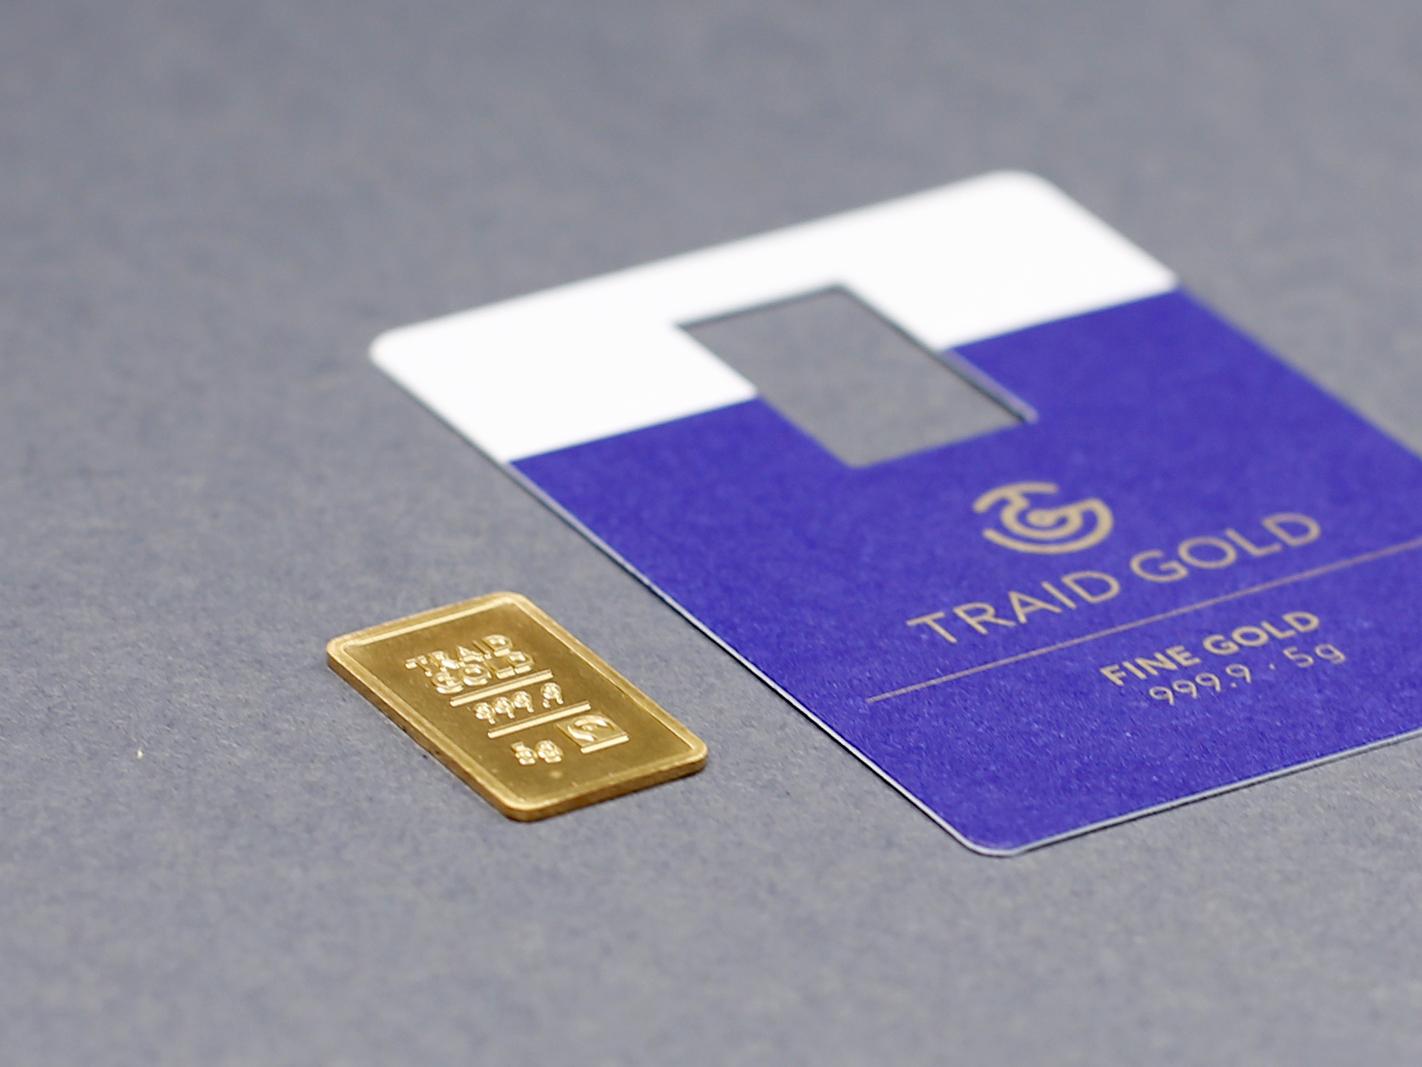 ATK-TRAID-GOLD-Corporat-Design-3.jpg